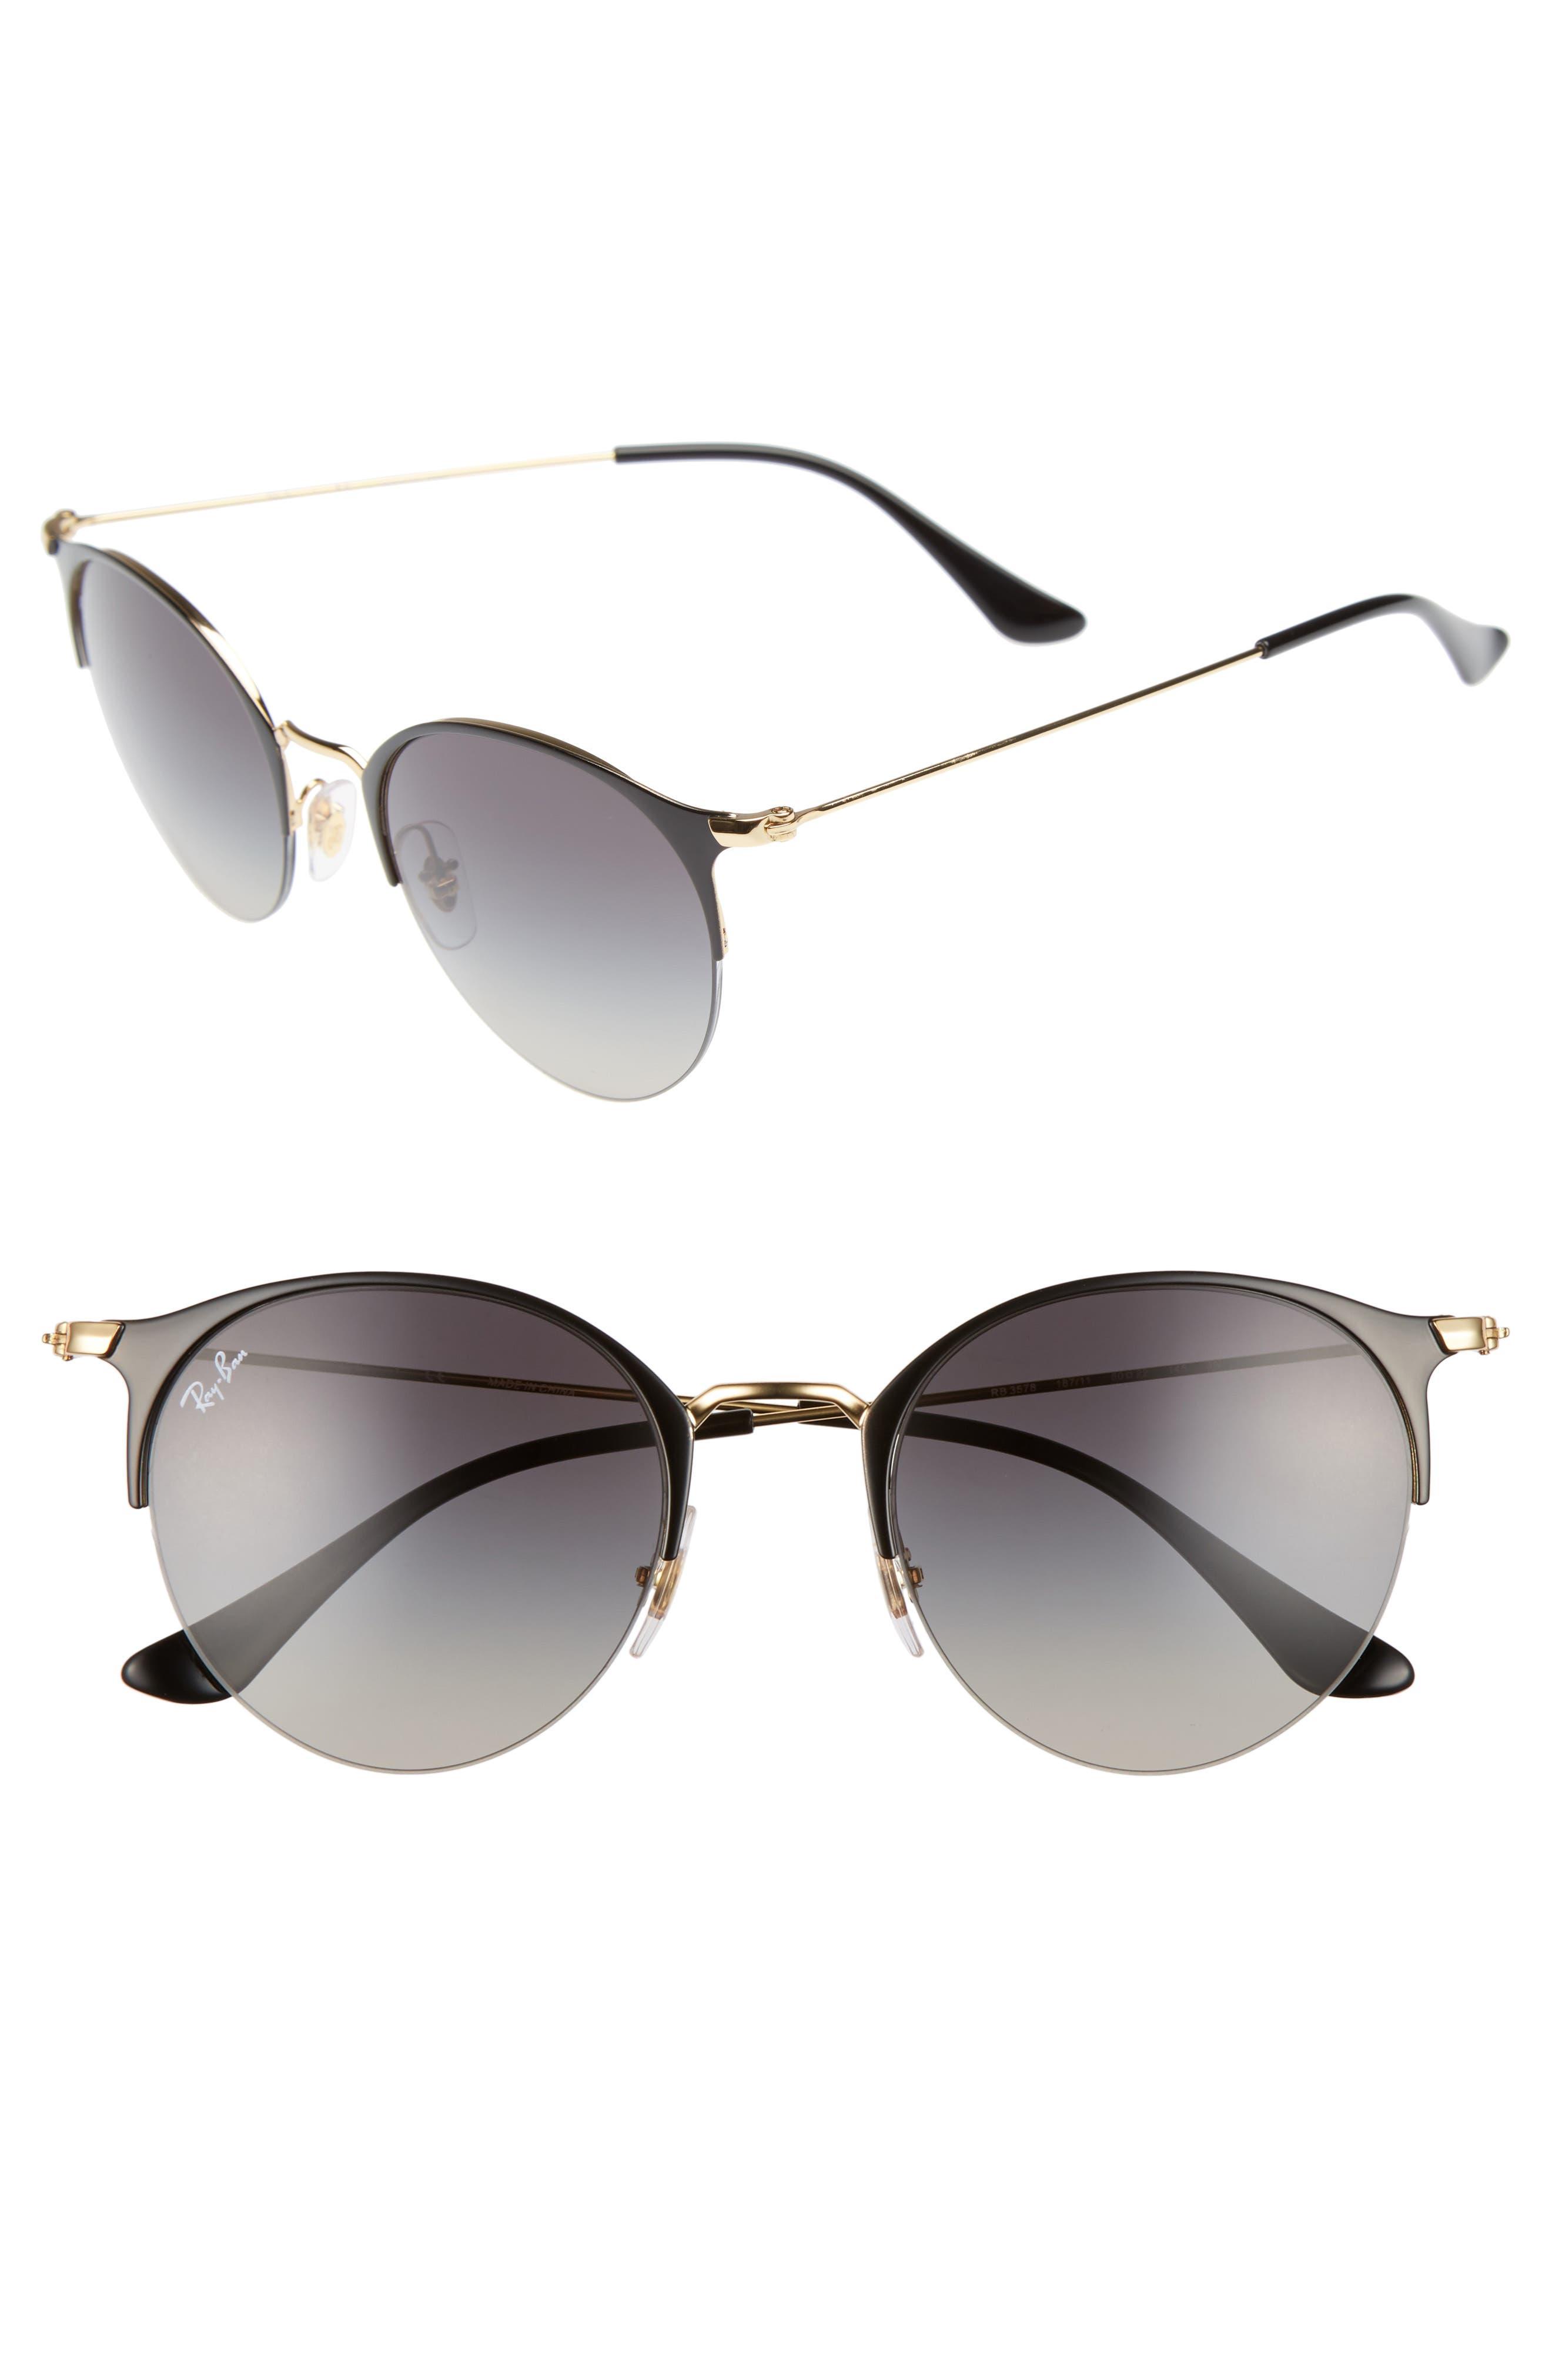 Ray-Ban 50mm Round Sunglasses